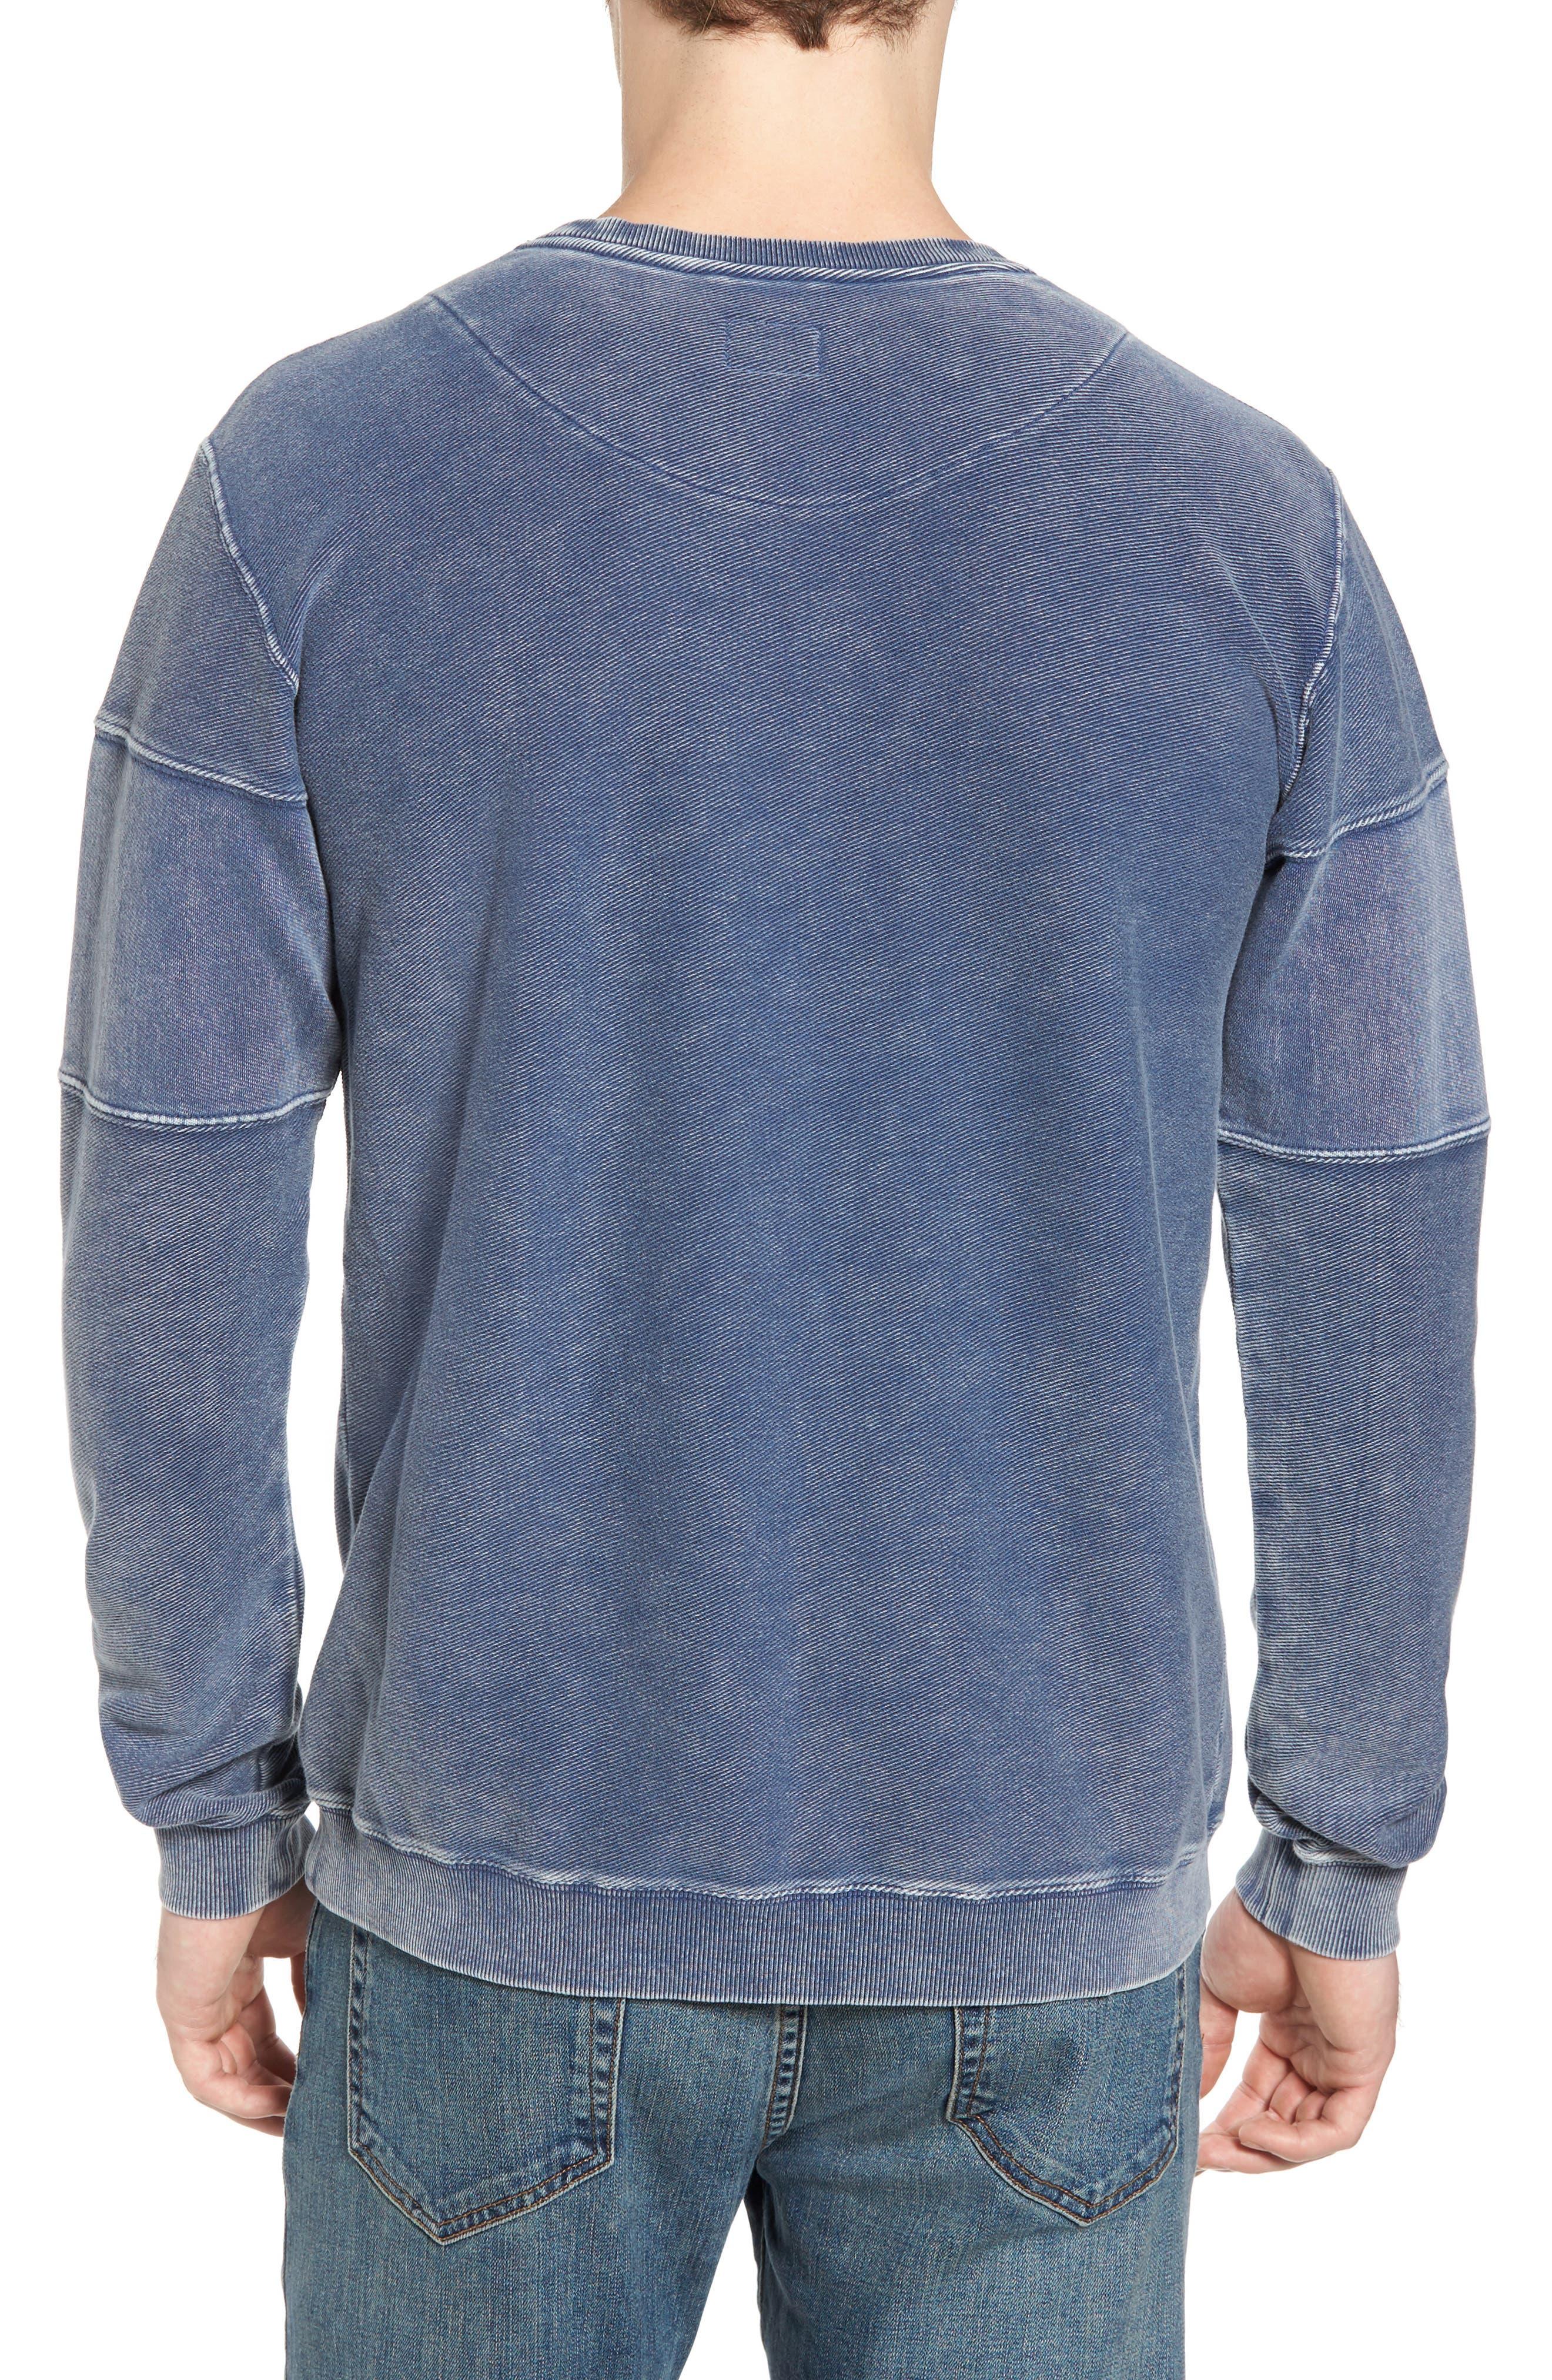 Distressed Sweatshirt,                             Alternate thumbnail 2, color,                             475